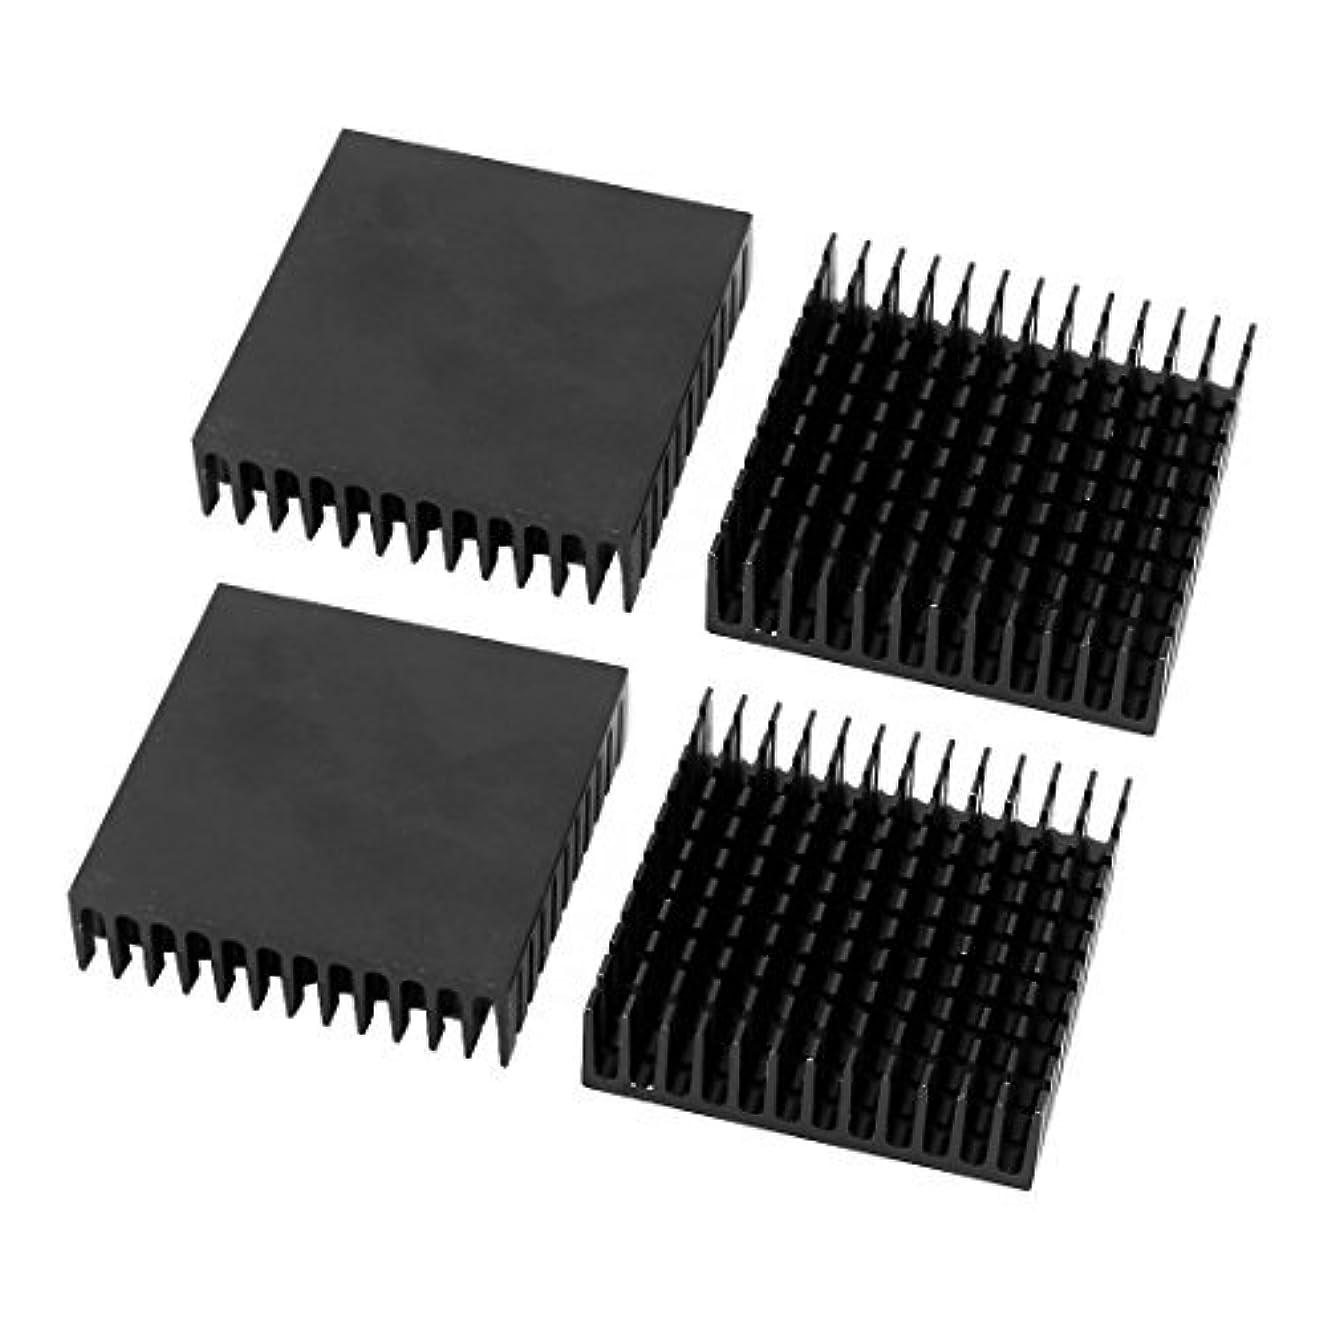 DealMux 4 Pcs 40 x 40 x 11mm Aluminum Heat Sink for PC Computer CPU